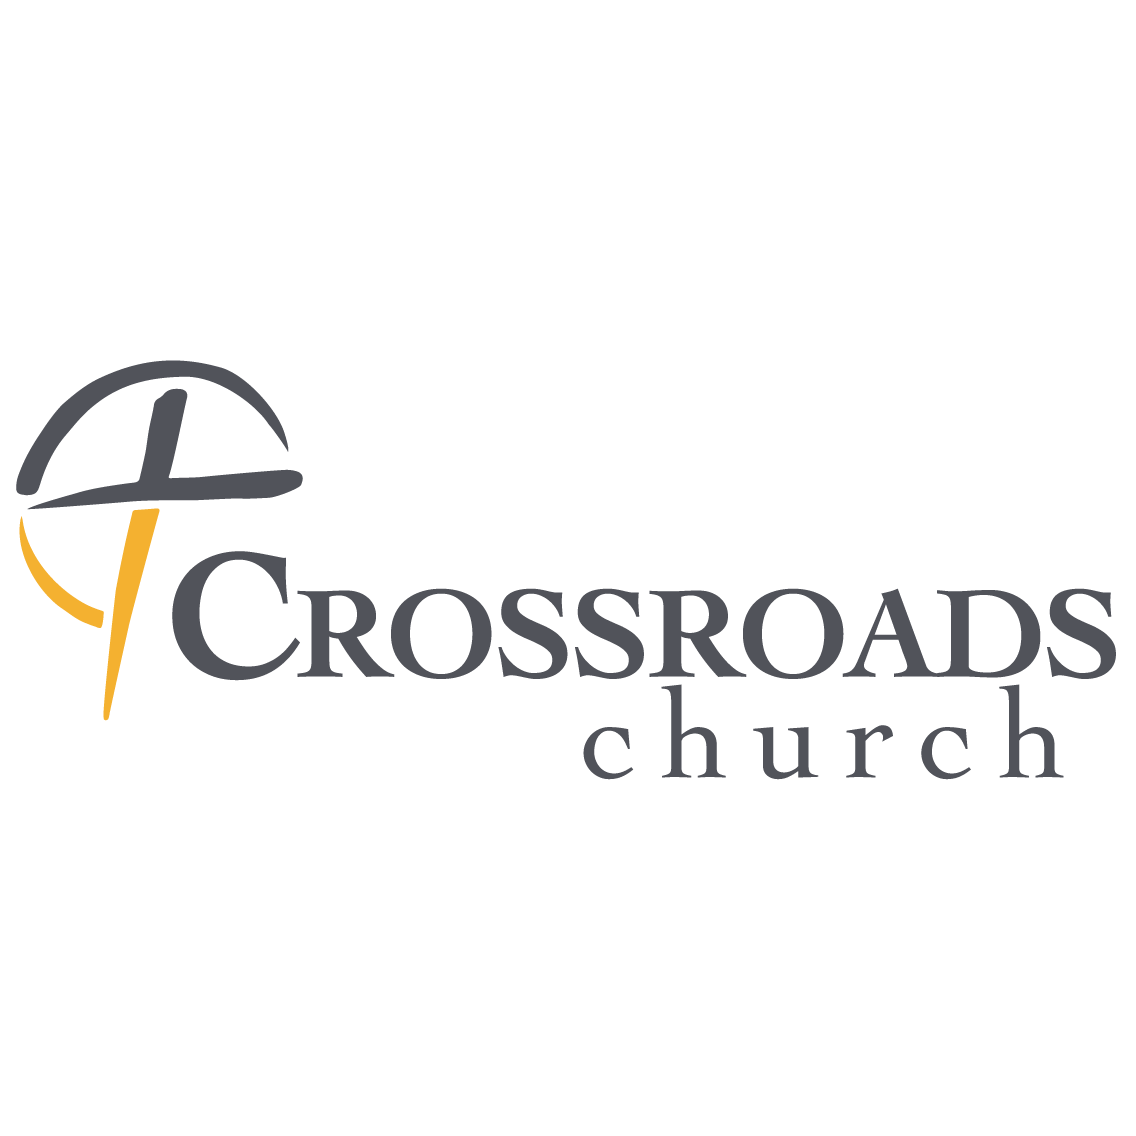 634_142-crossroadslogo_final-01.png